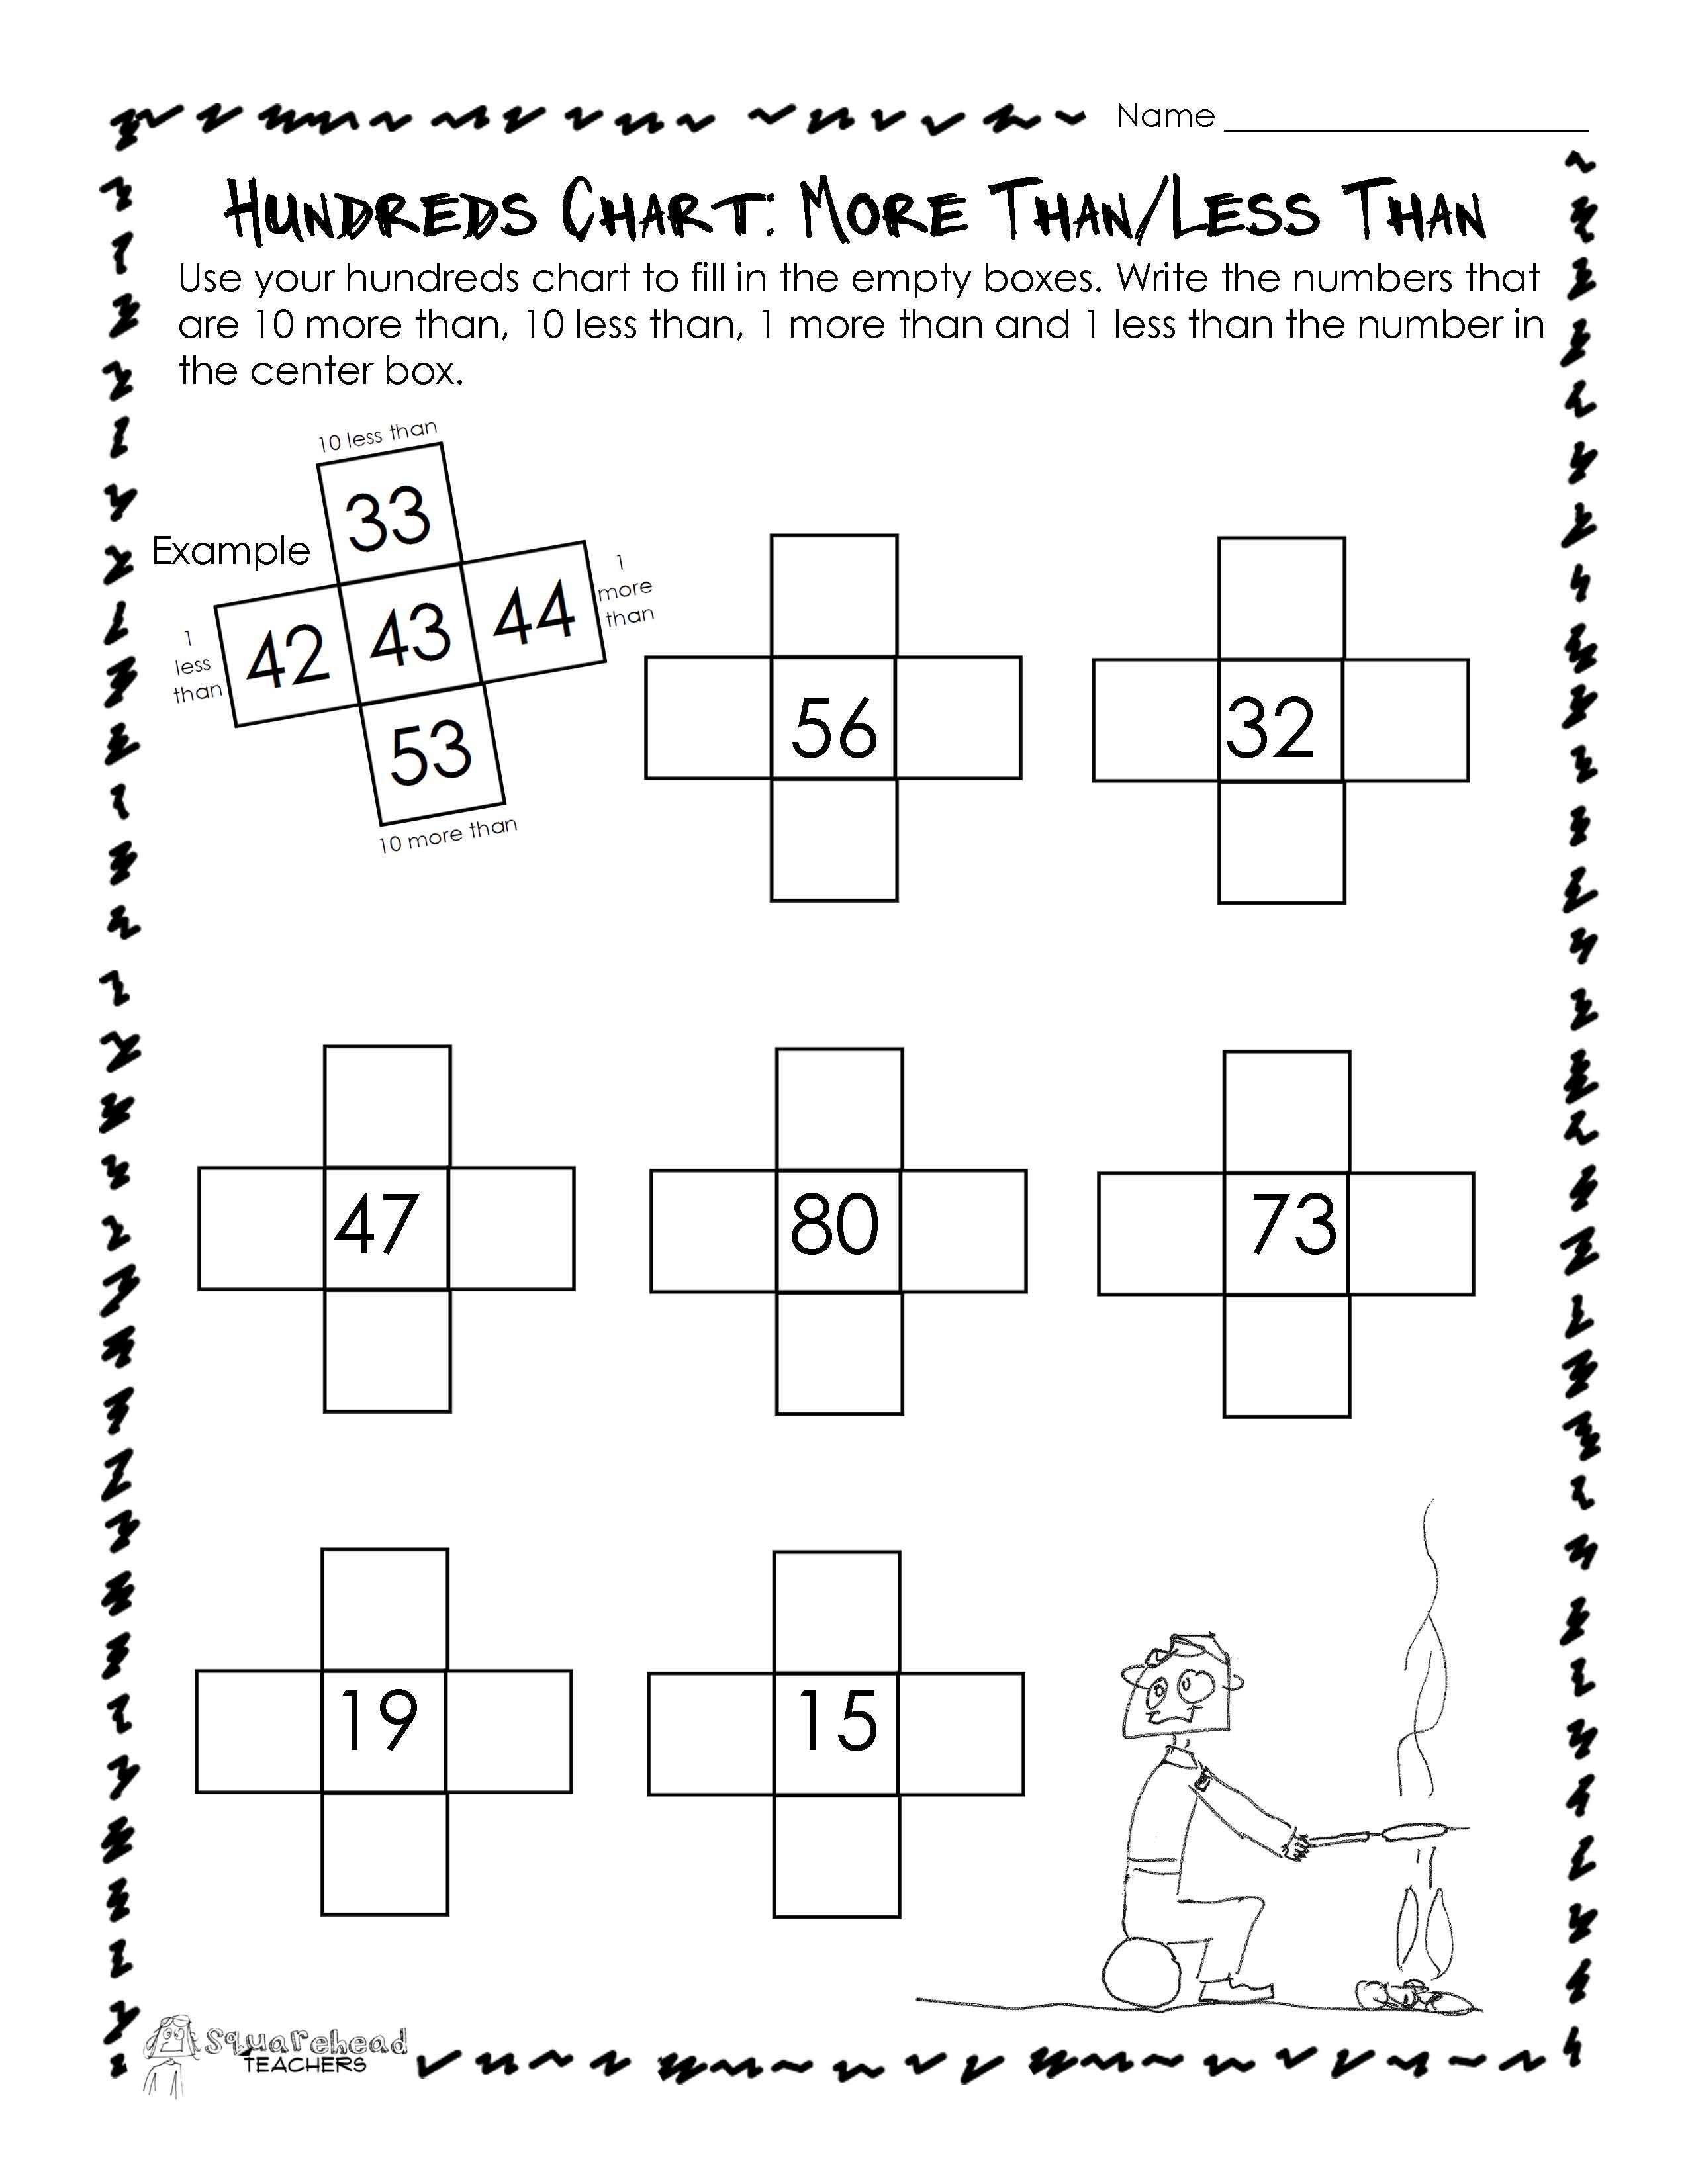 Patterns/Sequences : Squarehead Teachers